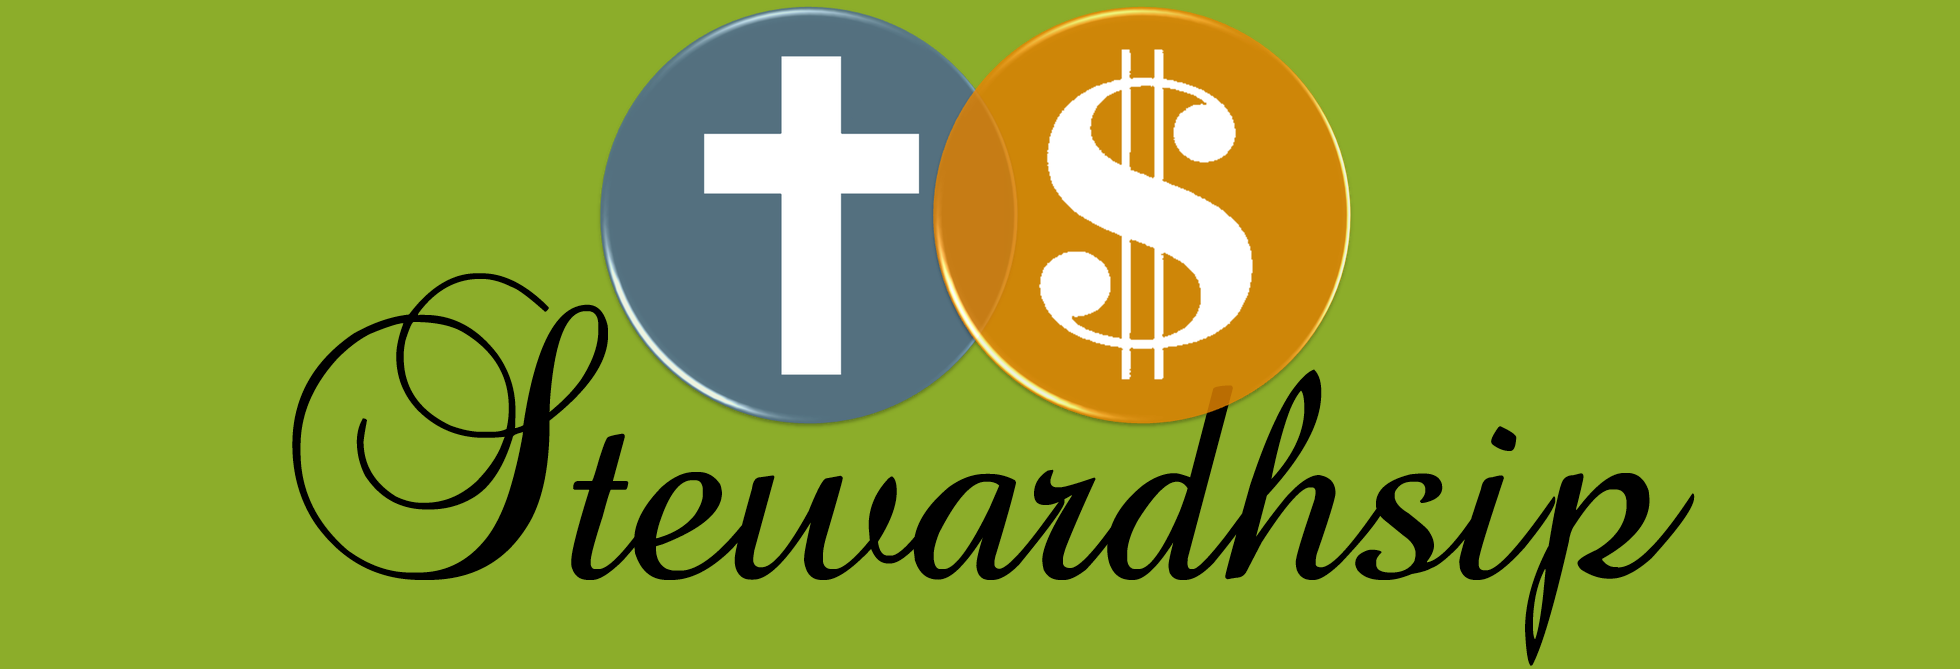 Stewardship Teens More 5